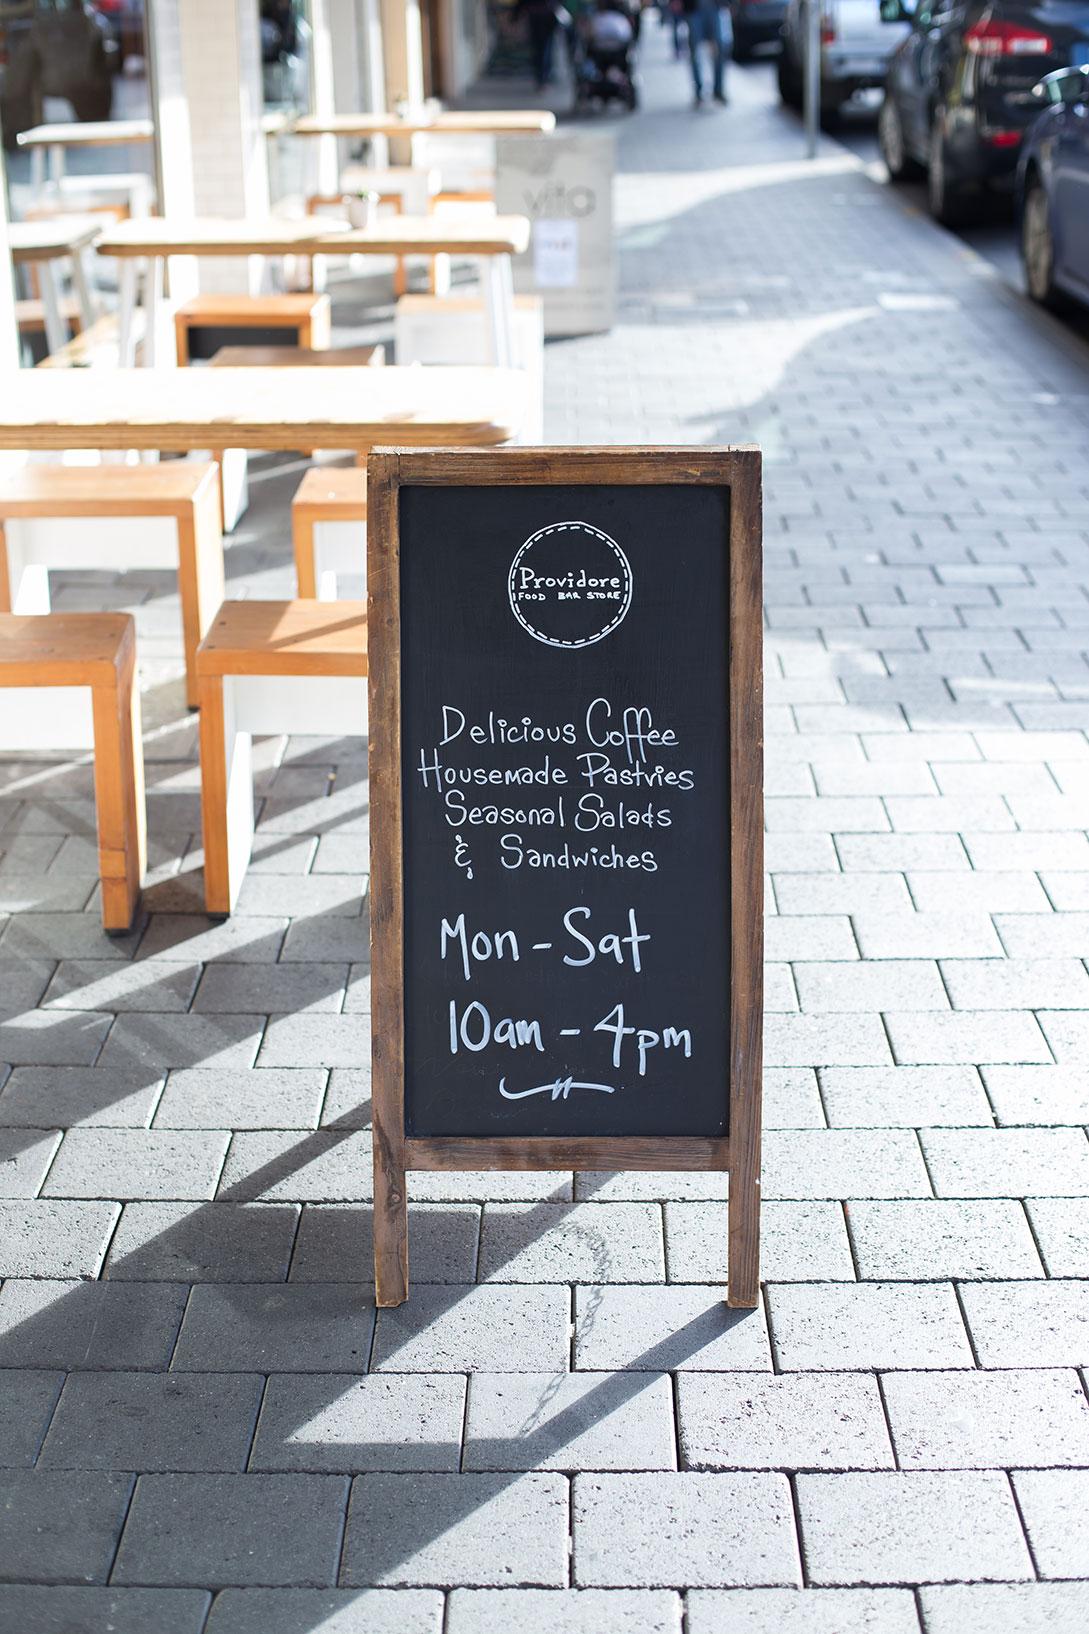 providore cafe hobart